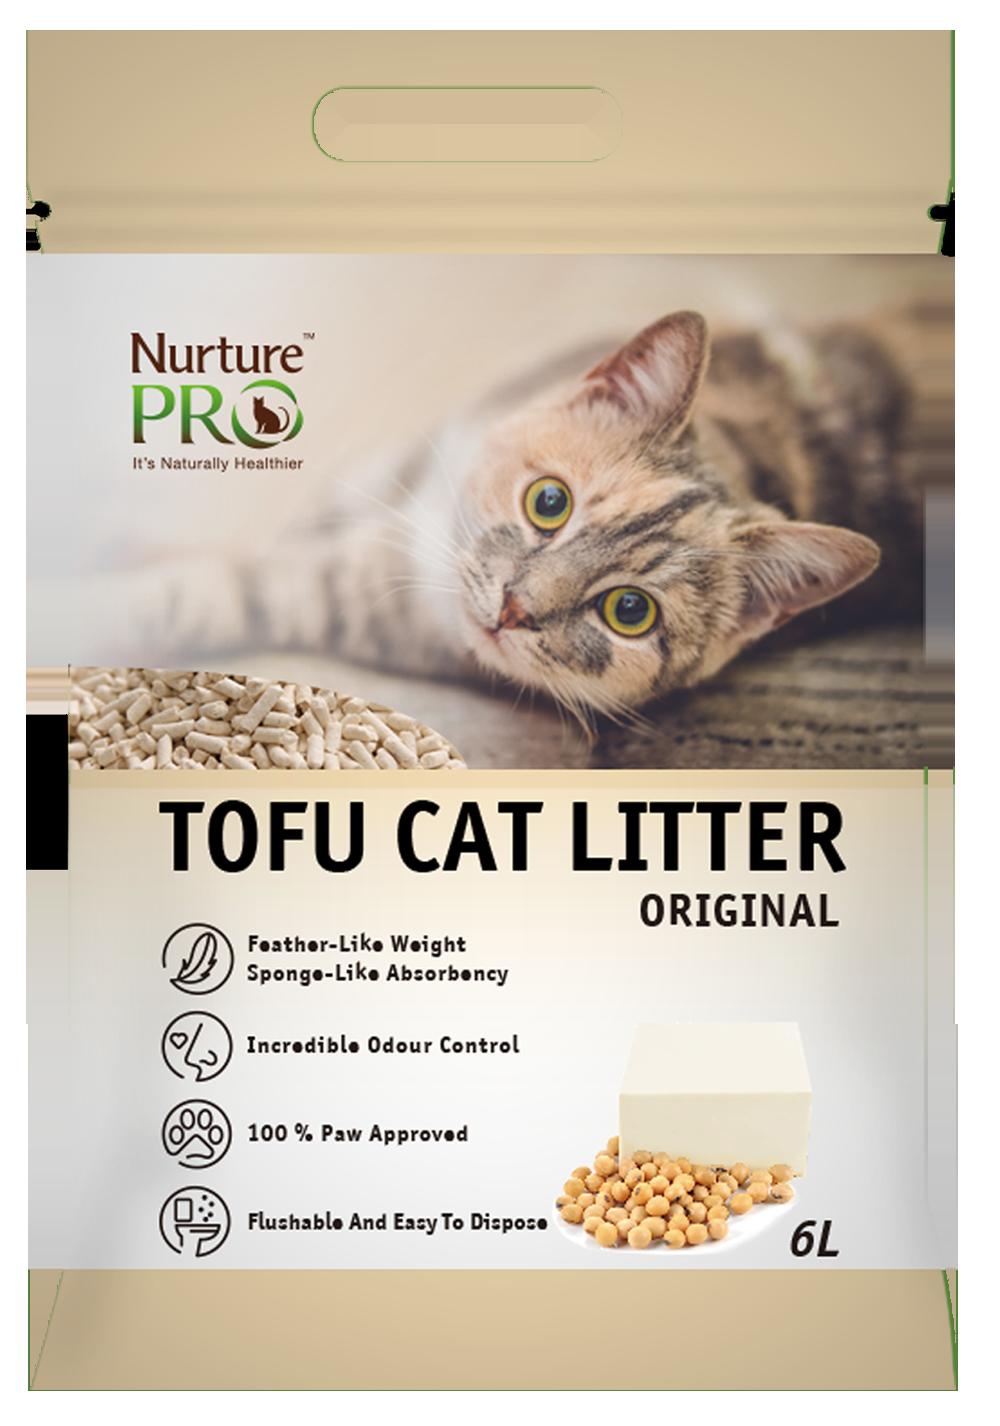 Nurture Pro Cat Tofu Litter Original 6 L